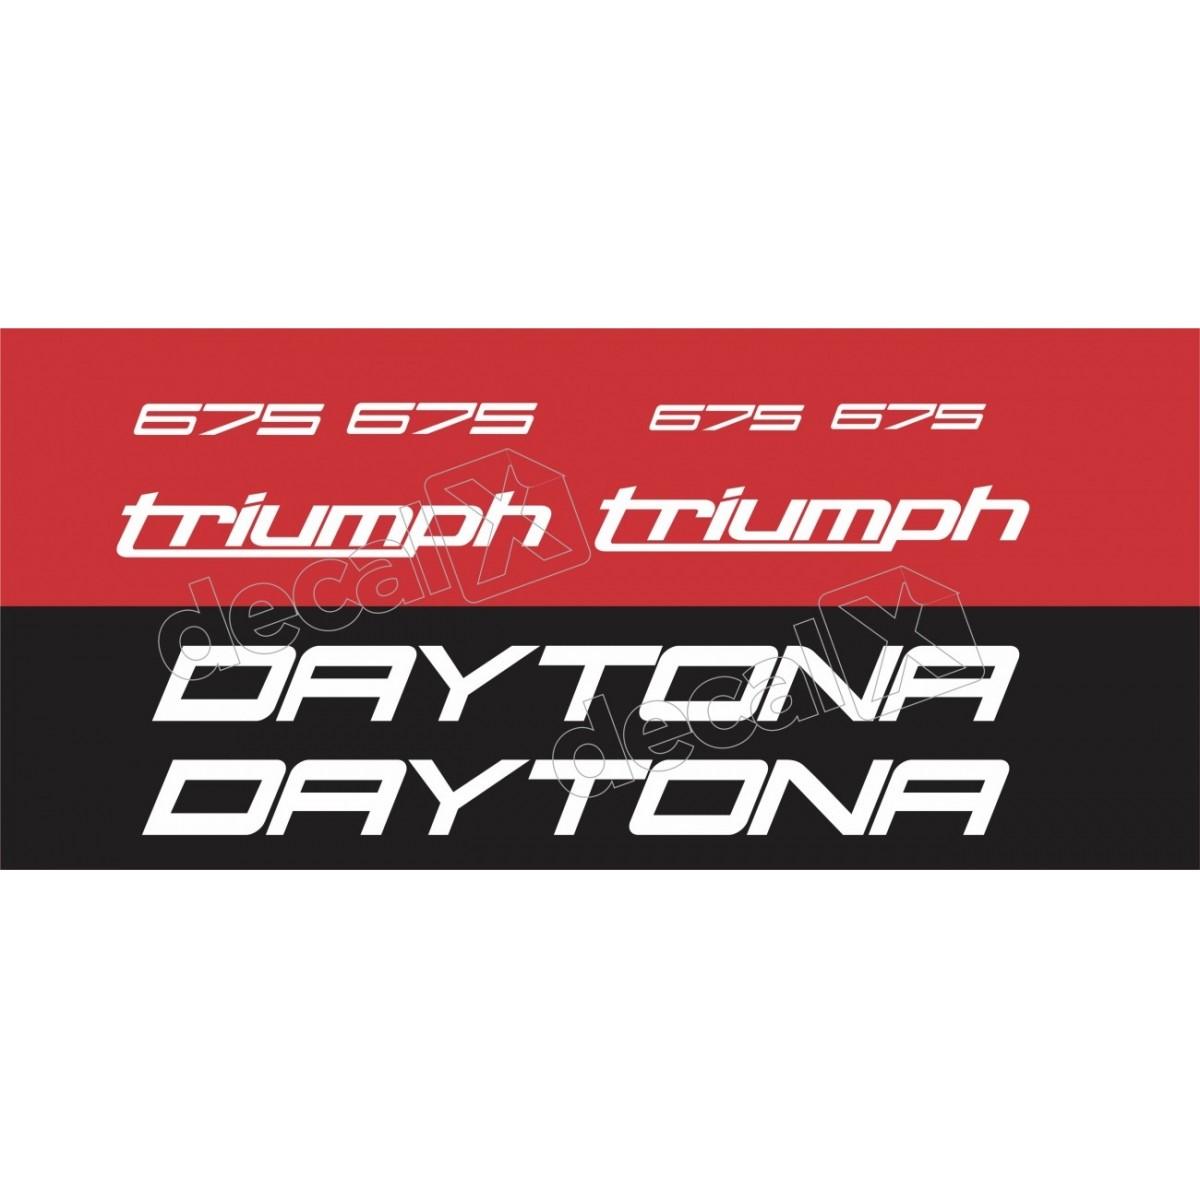 Kit Adesivos Triumph Daytona 675 Vermelha Decalx